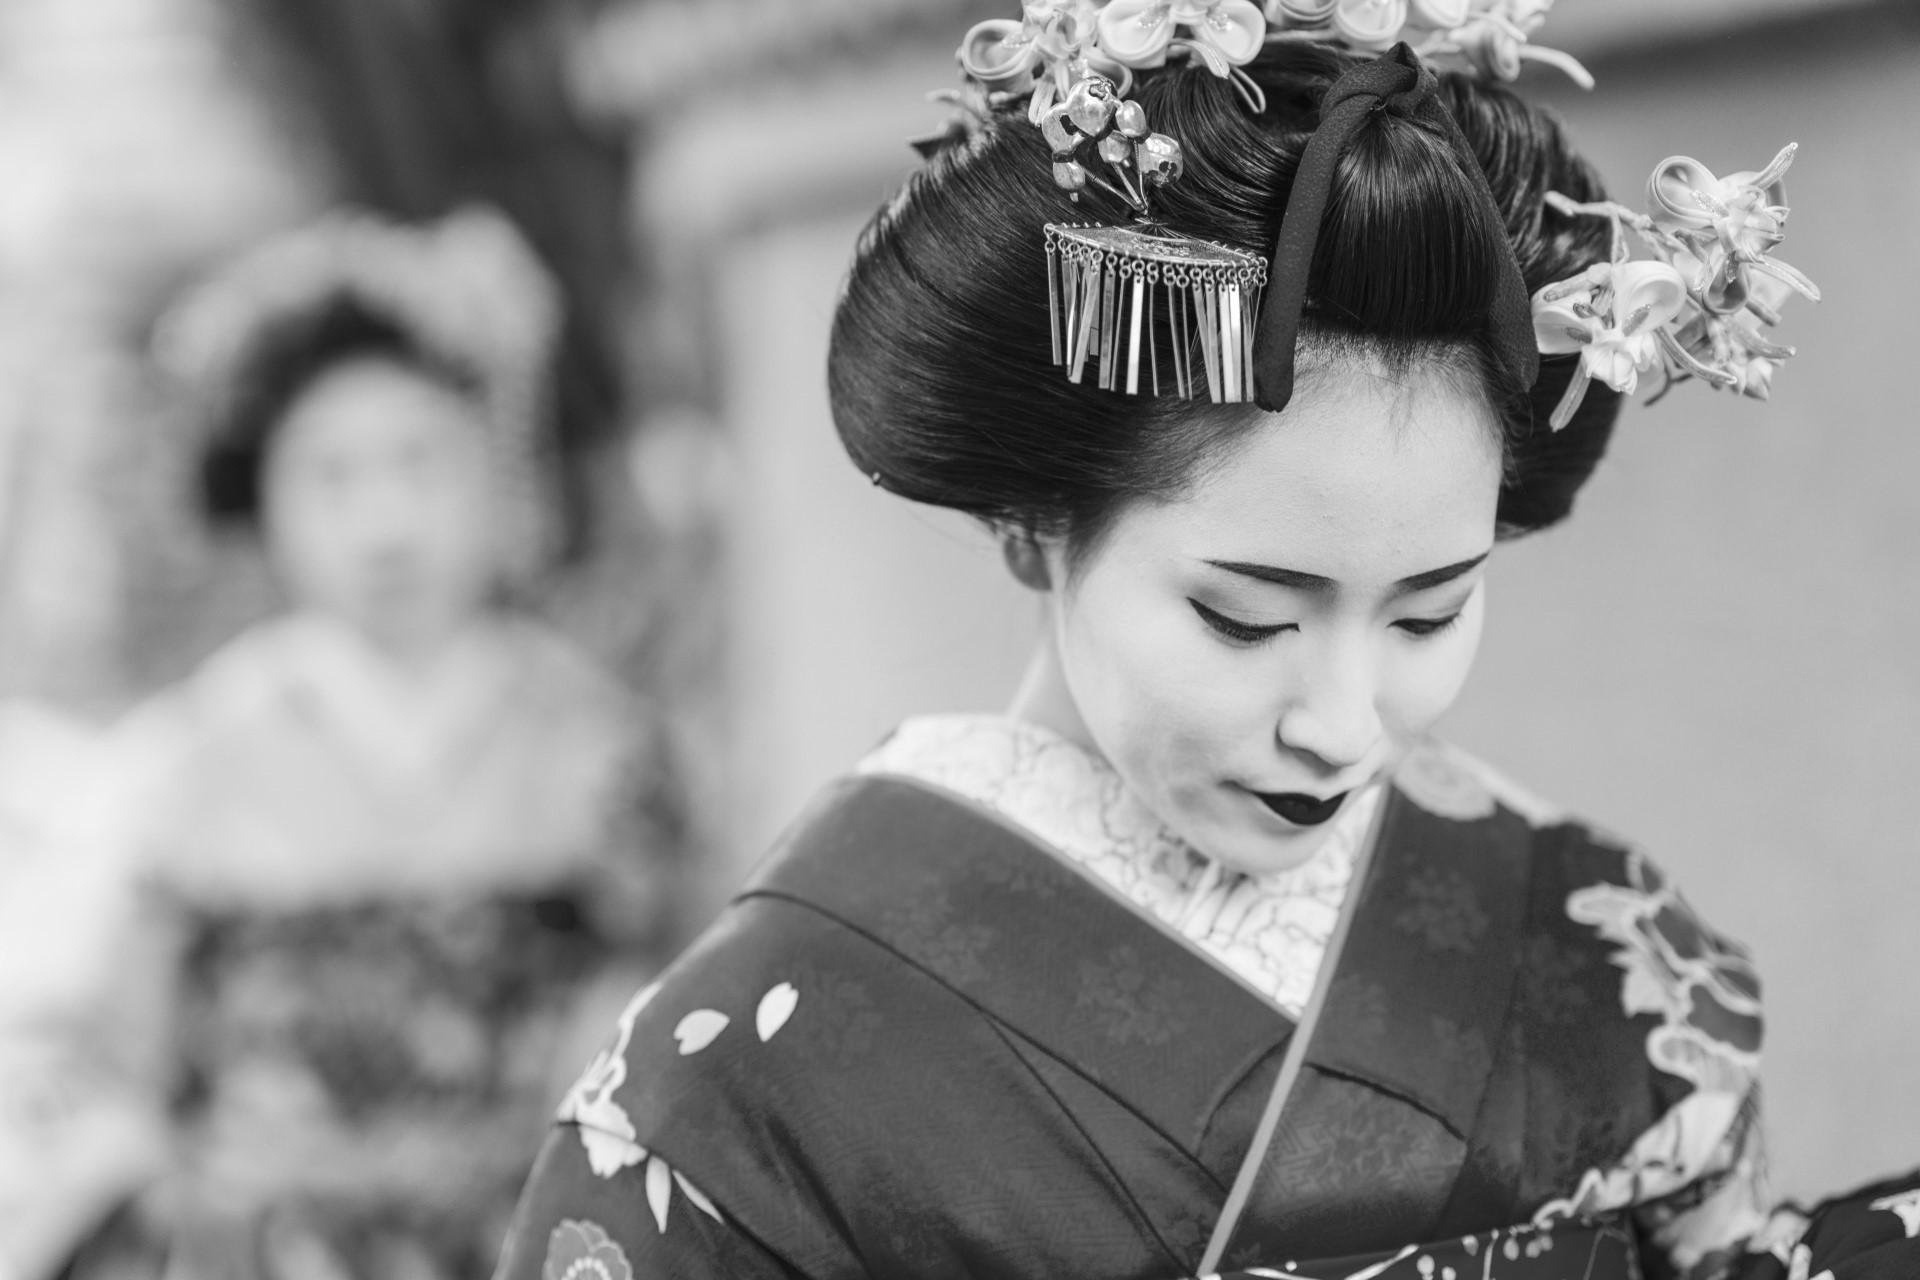 Geisha, artista e intrattenitrice giapponese